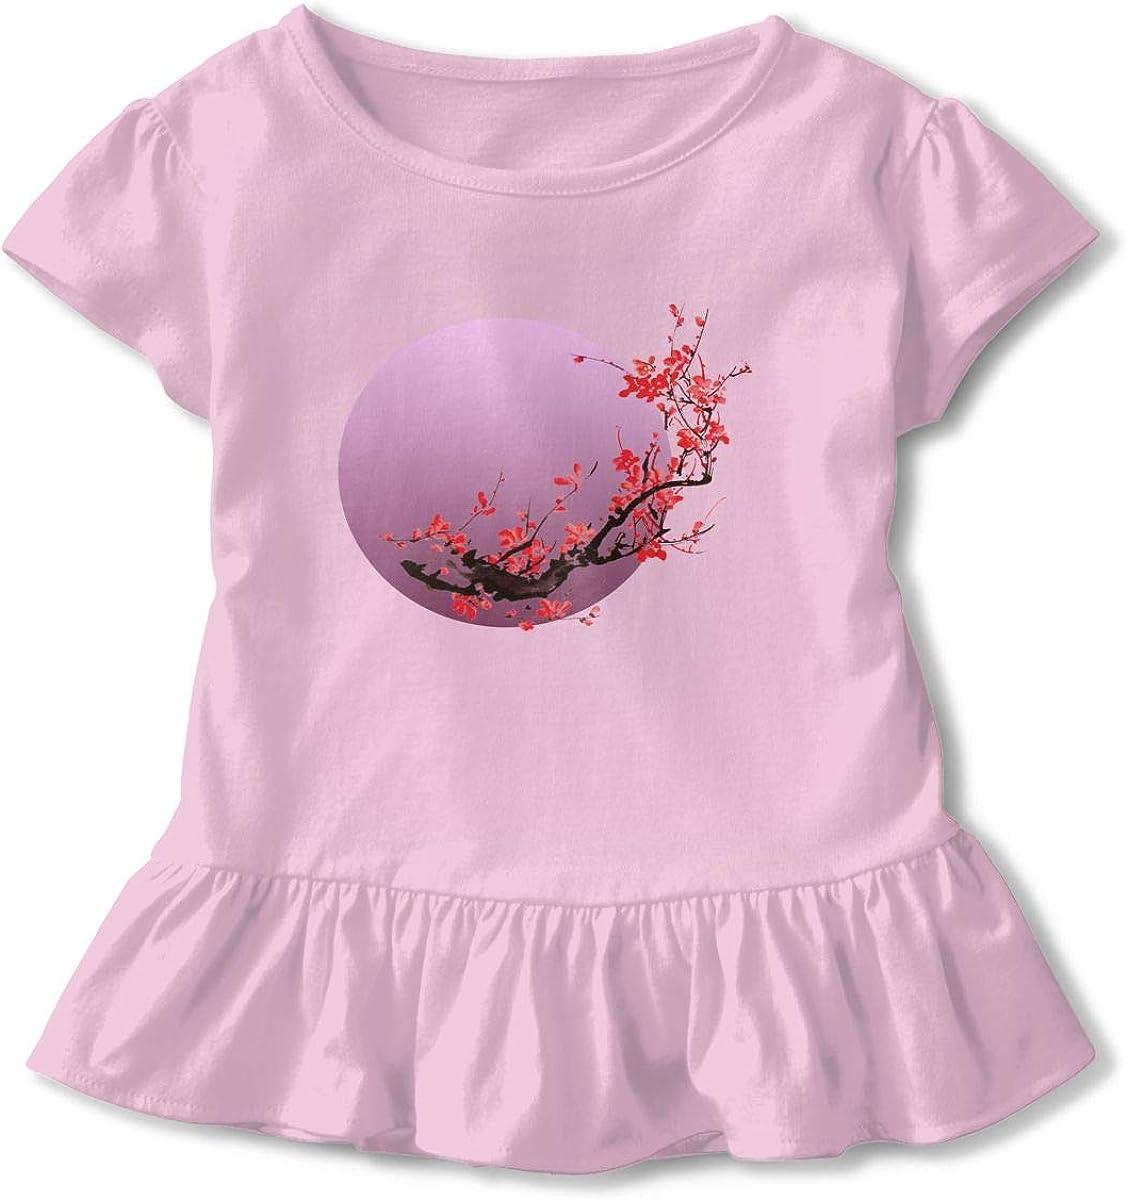 Moon Sakura Flowers Japanese Cherry Toddler Girls T Shirt Kids Cotton Short Sleeve Ruffle Tee